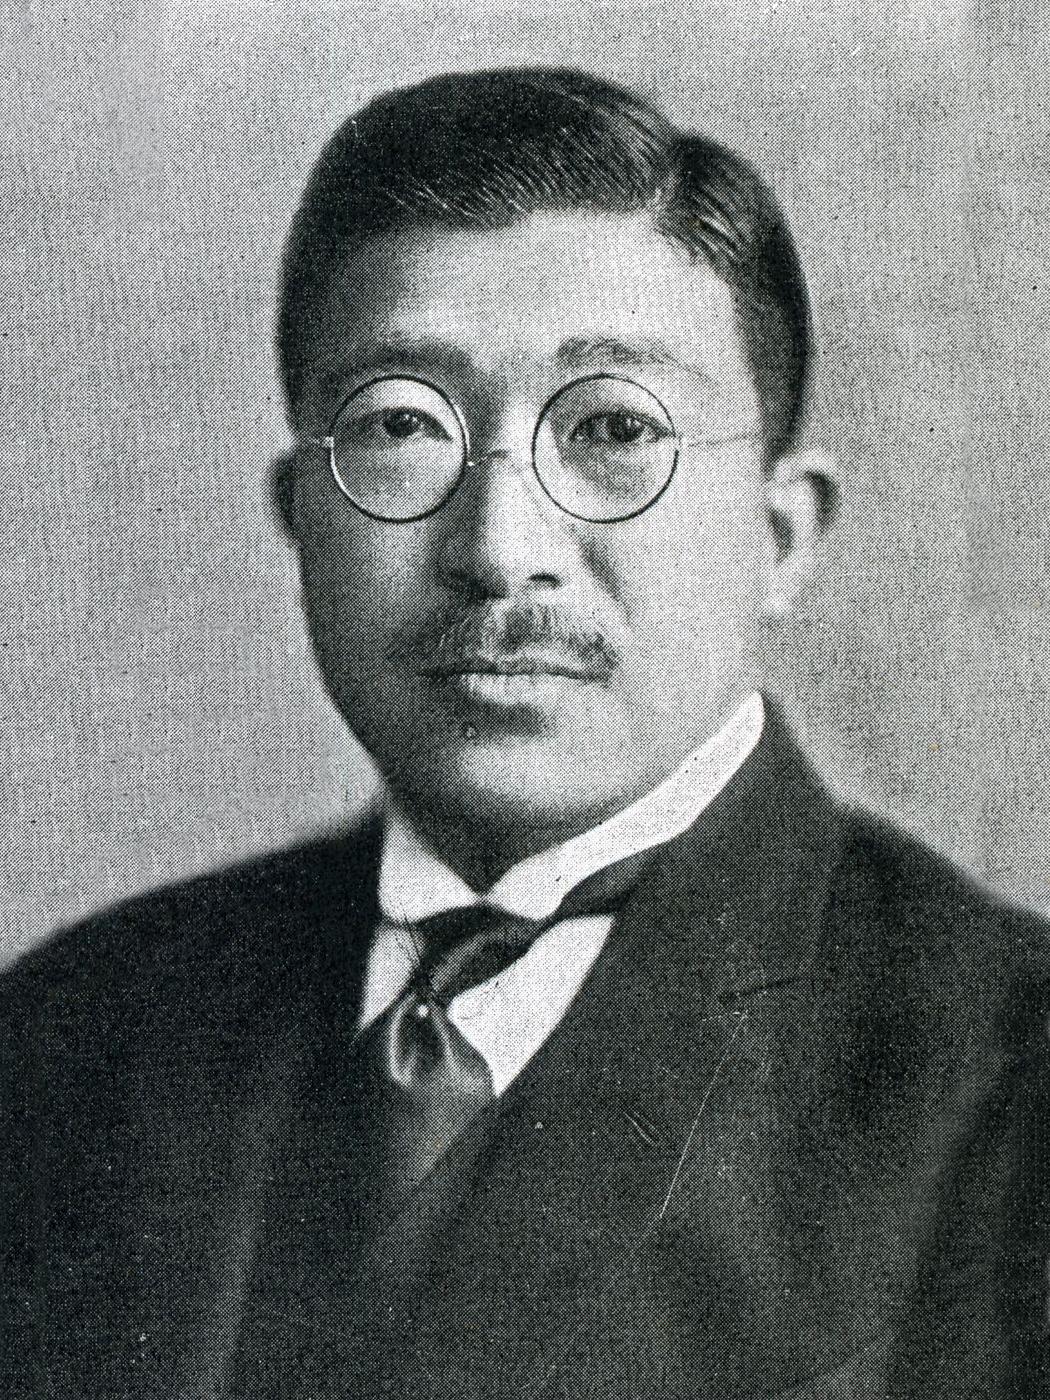 ... Hatoyama 鳩山一郎 Image - anoword : Search - Video, Image, Blog